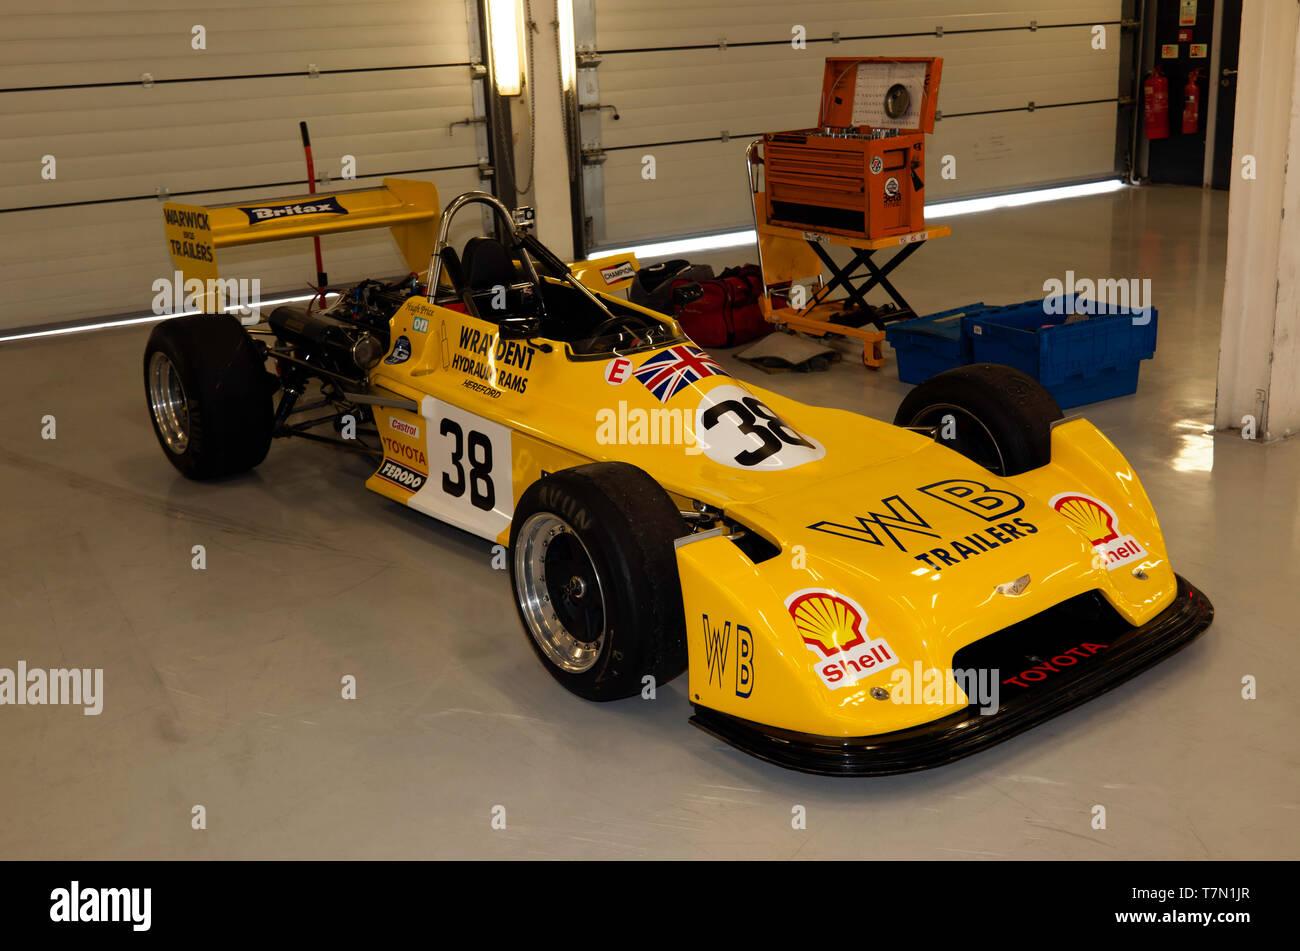 1ab30b4bc Three-quarter front view of Hugh Price's Yellow, 1977, Chevron B38 Formula 3